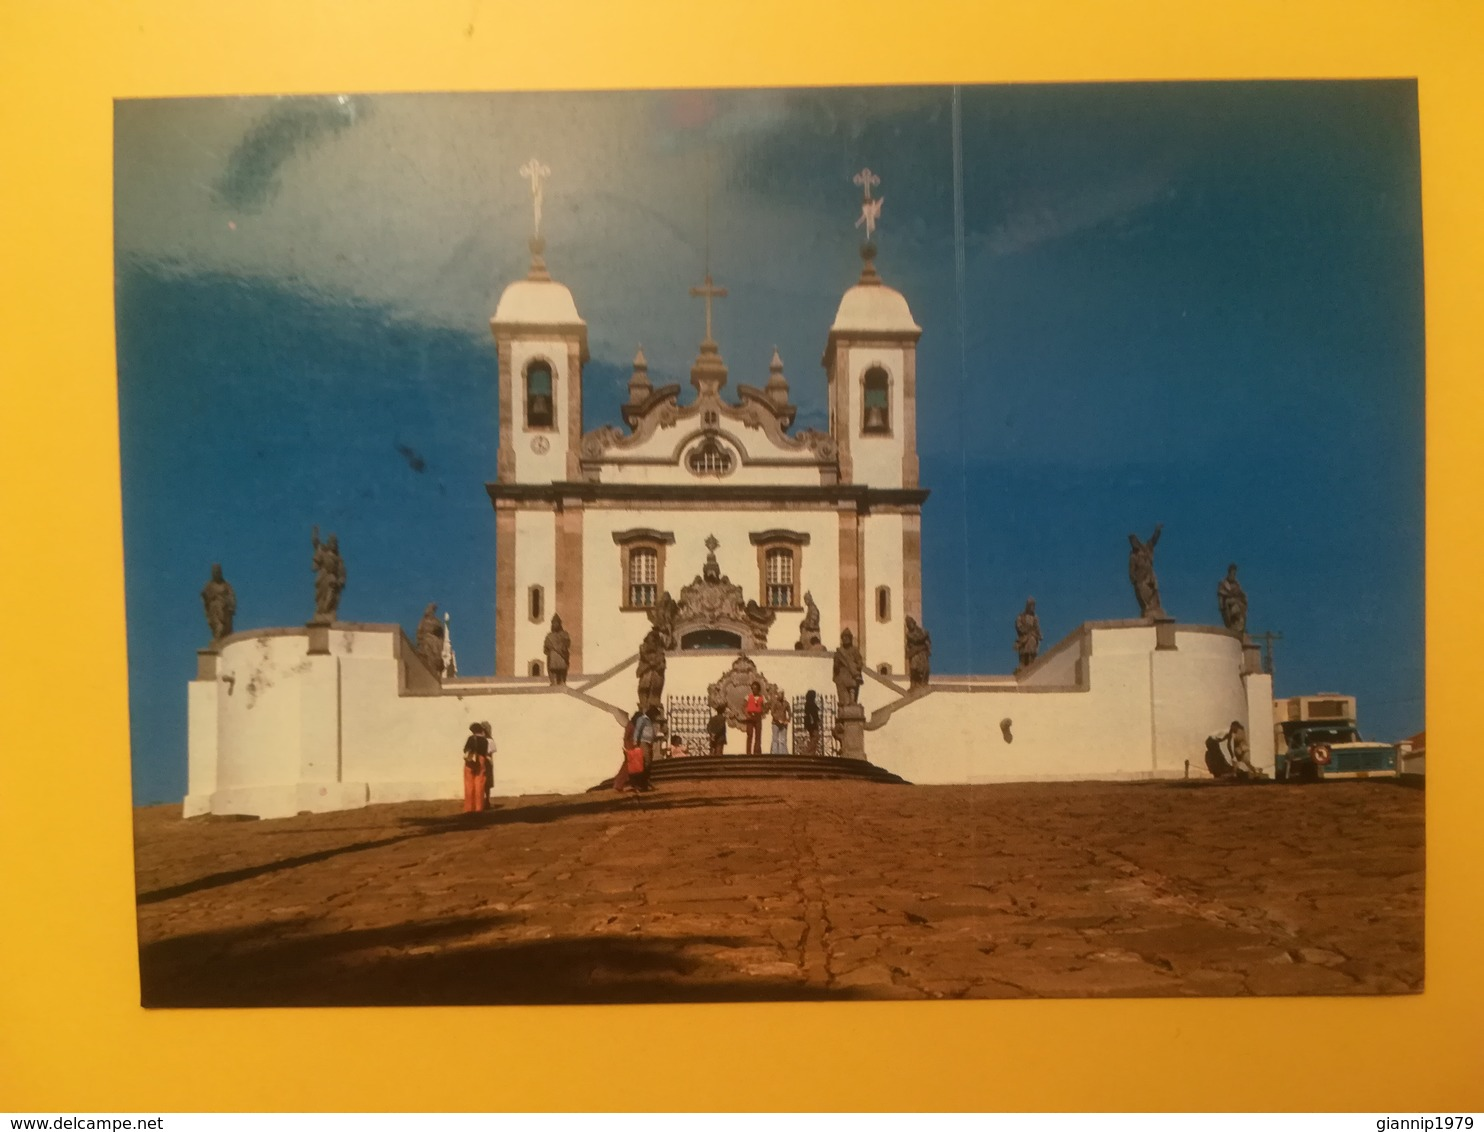 CARTOLINA POSTCARD BRASILE BRASIL 1980 CONGONHAS BASILICA SENHOR JESUS MATOSINHOS BOLLO INDUSTRY OBLITERE' RIO DE JANEIR - Brasile